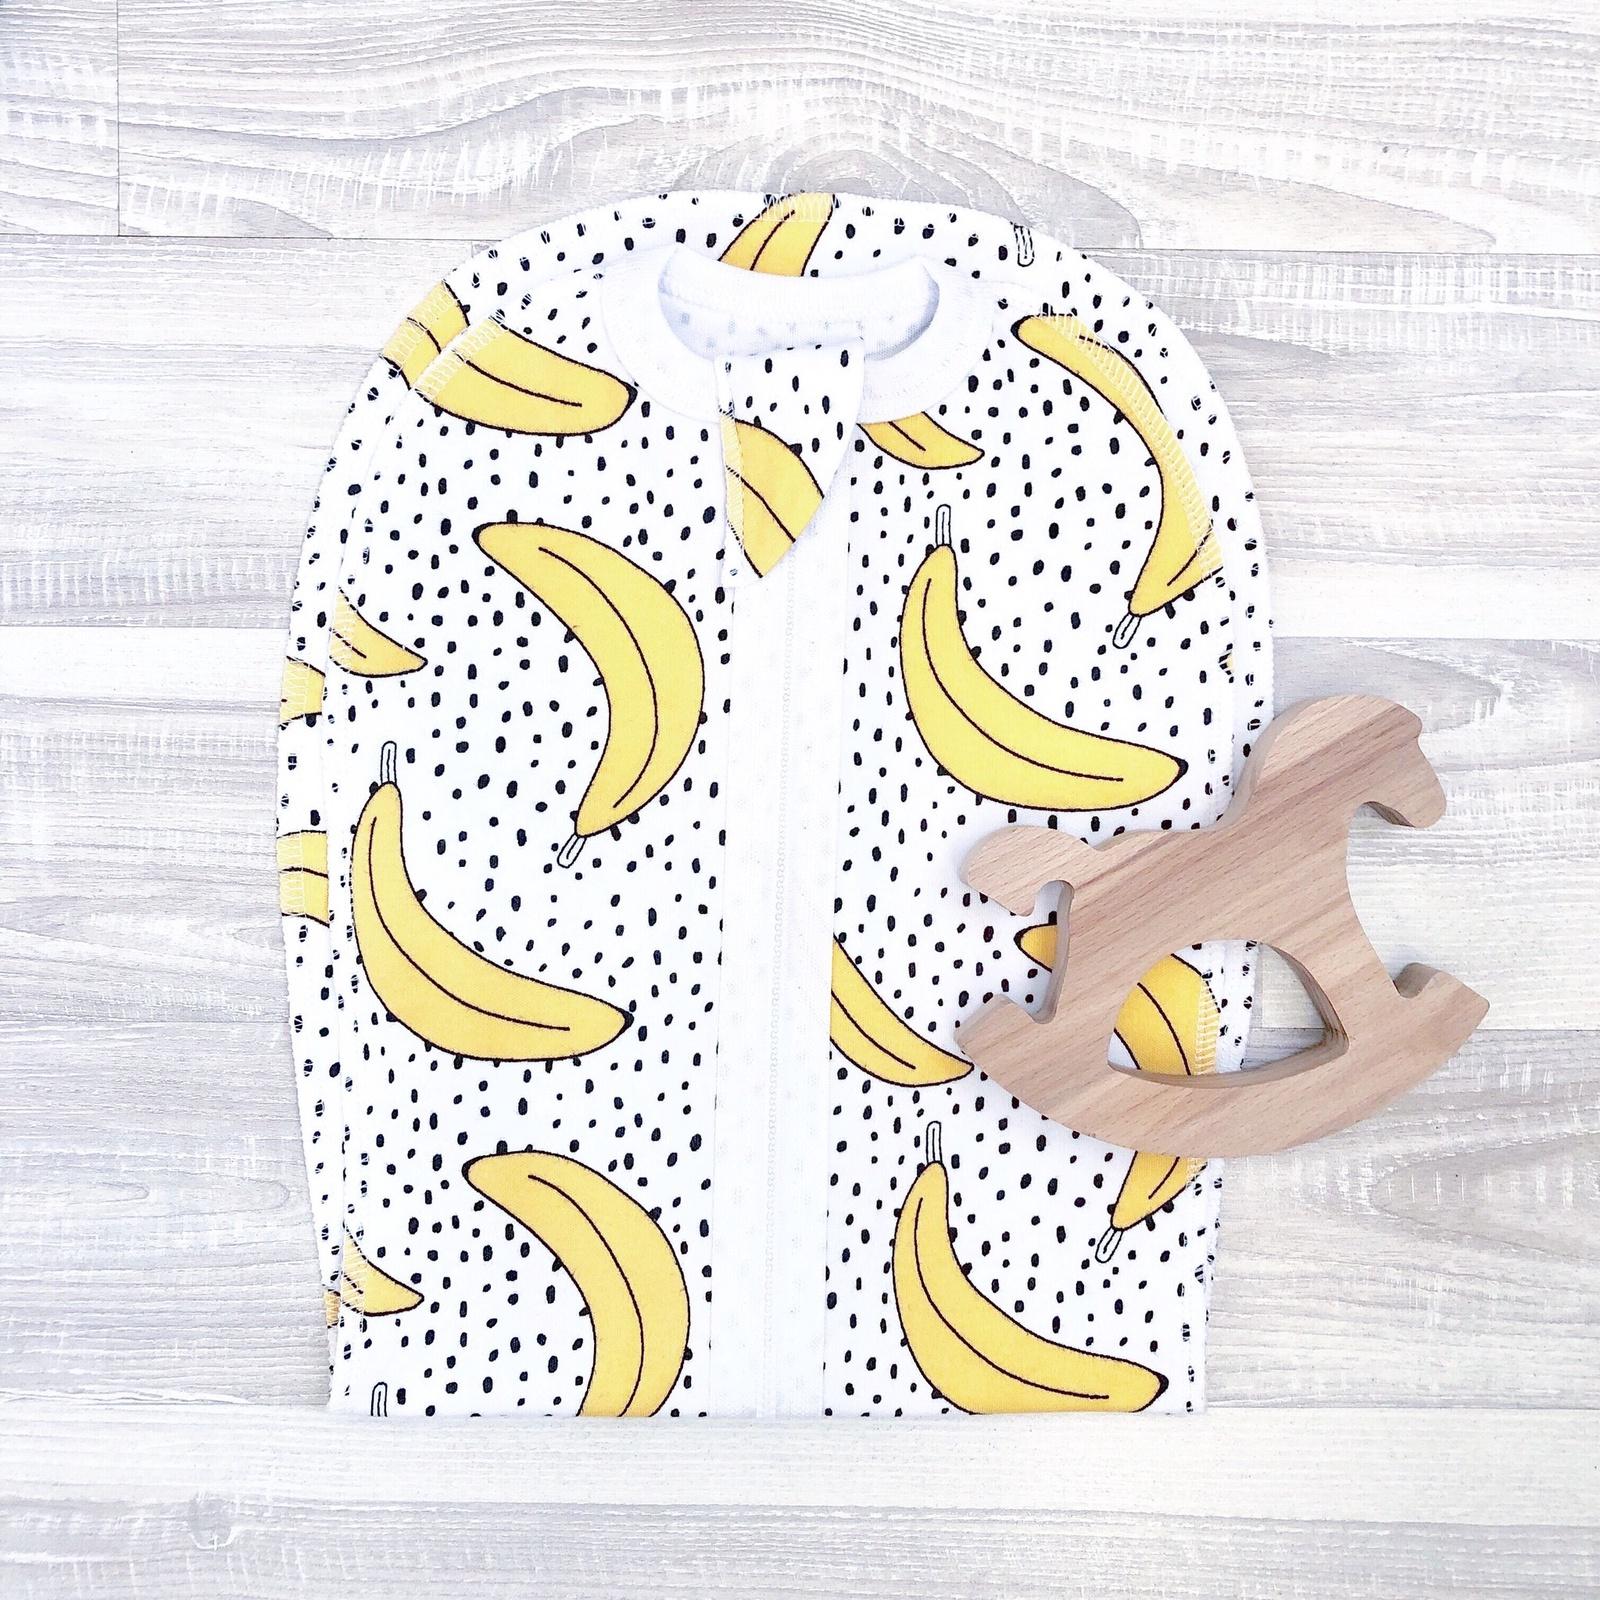 Пеленка-кокон Mjolk  Бананы Пеленальный кокон Mjolk на двухзамковой...